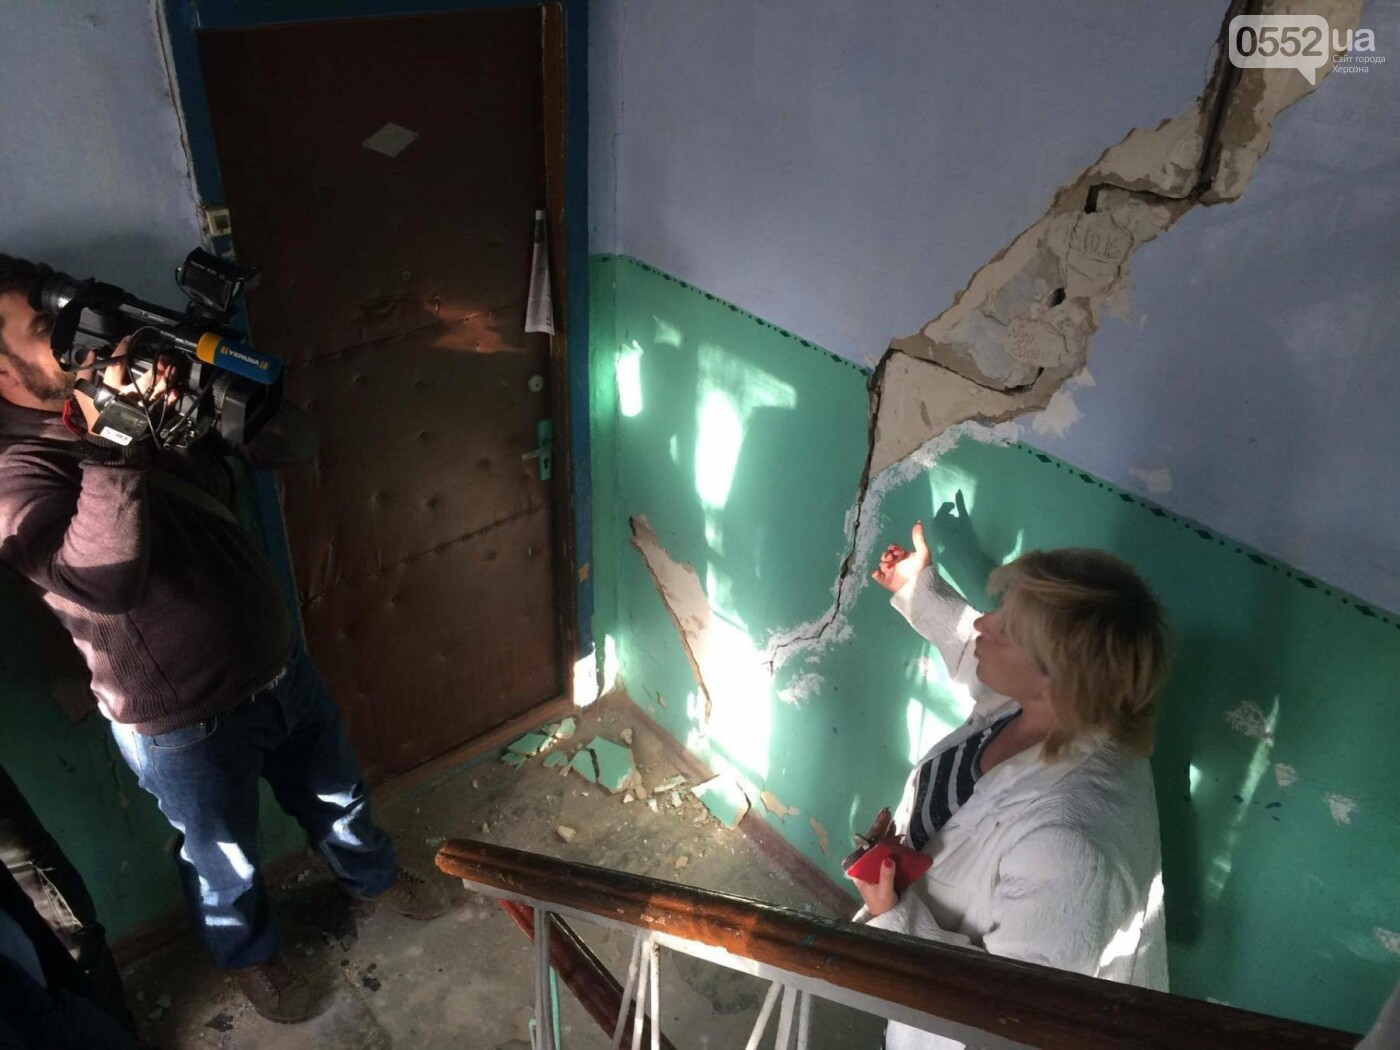 В Херсоне глава ОГА встретился с жильцами аварийного дома, фото-3